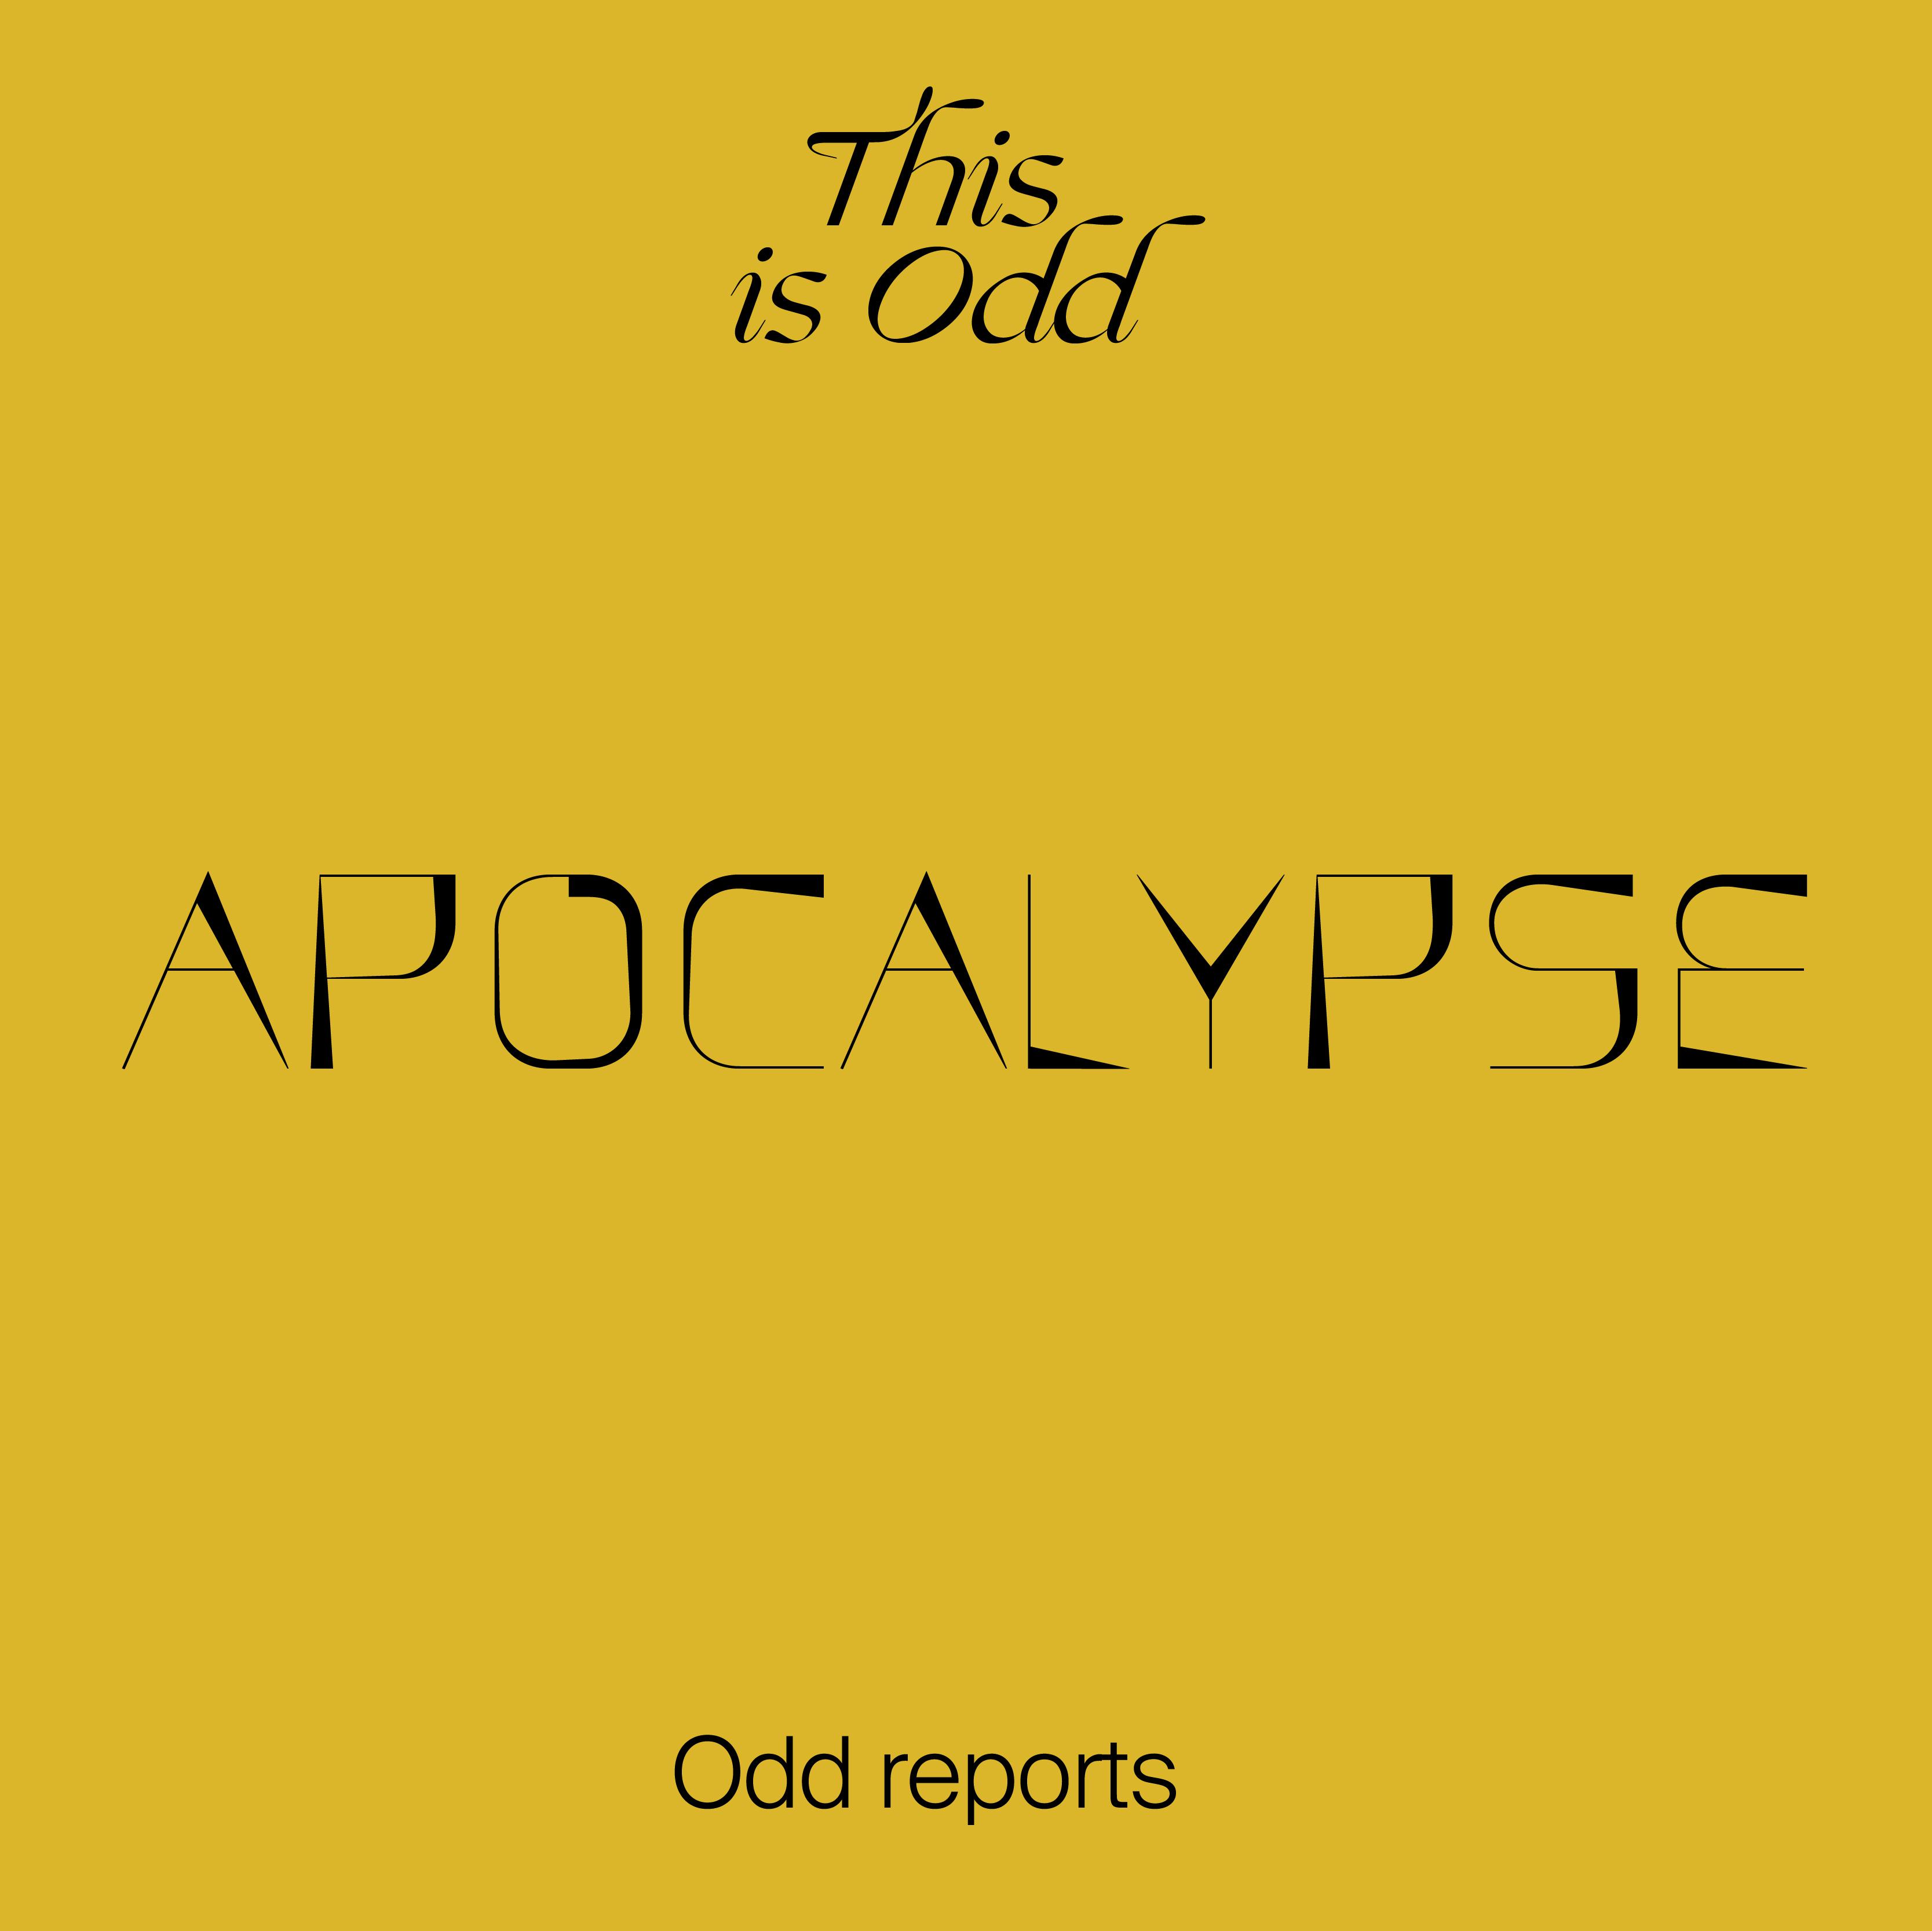 08 Oddreports_02 apocalypse